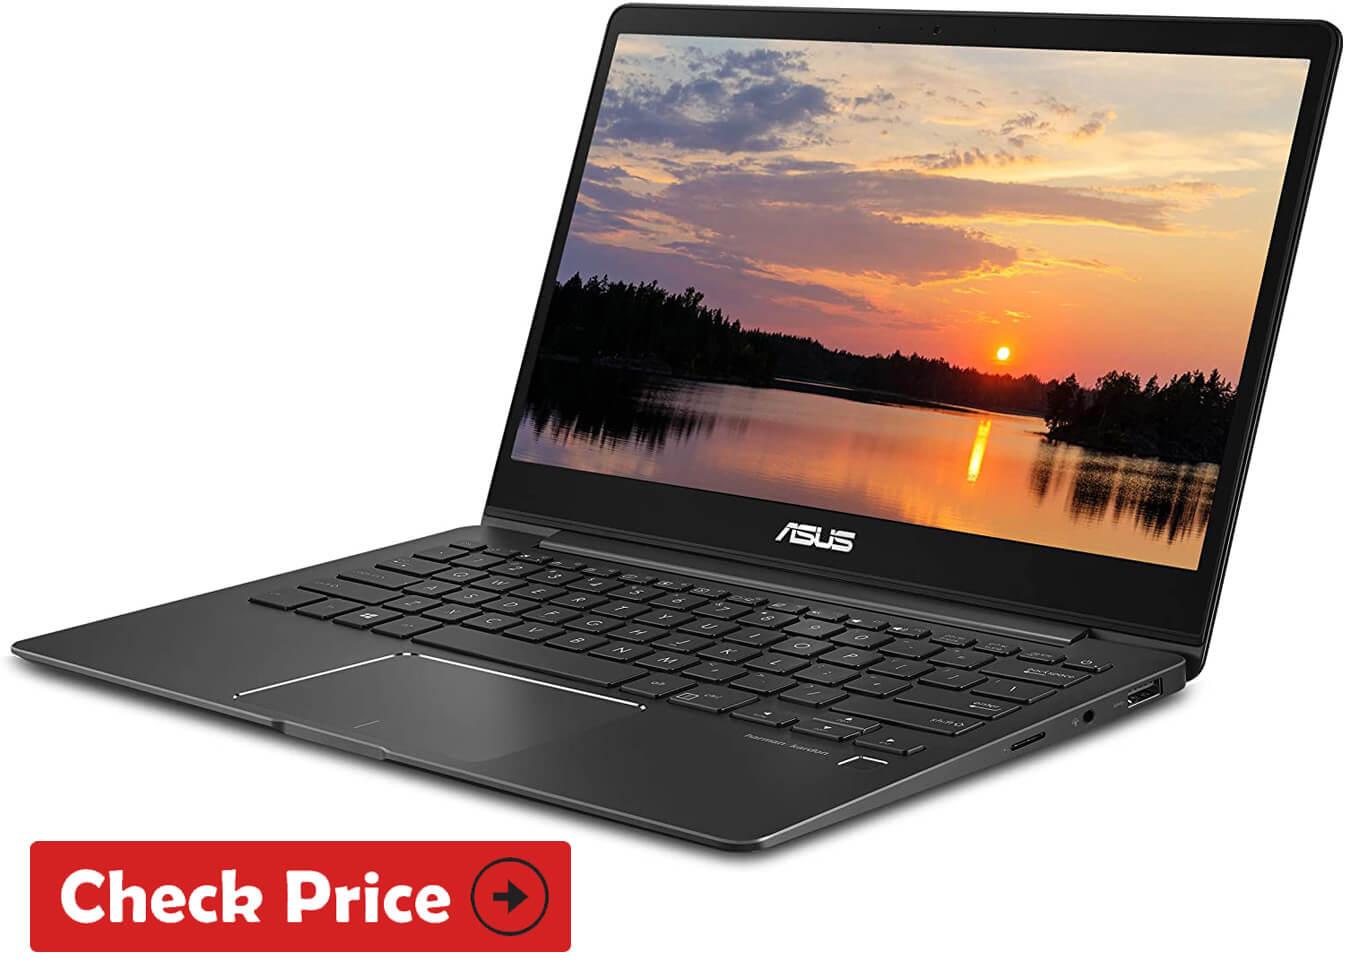 ASUS ZenBook 13 gaming laptop under 700